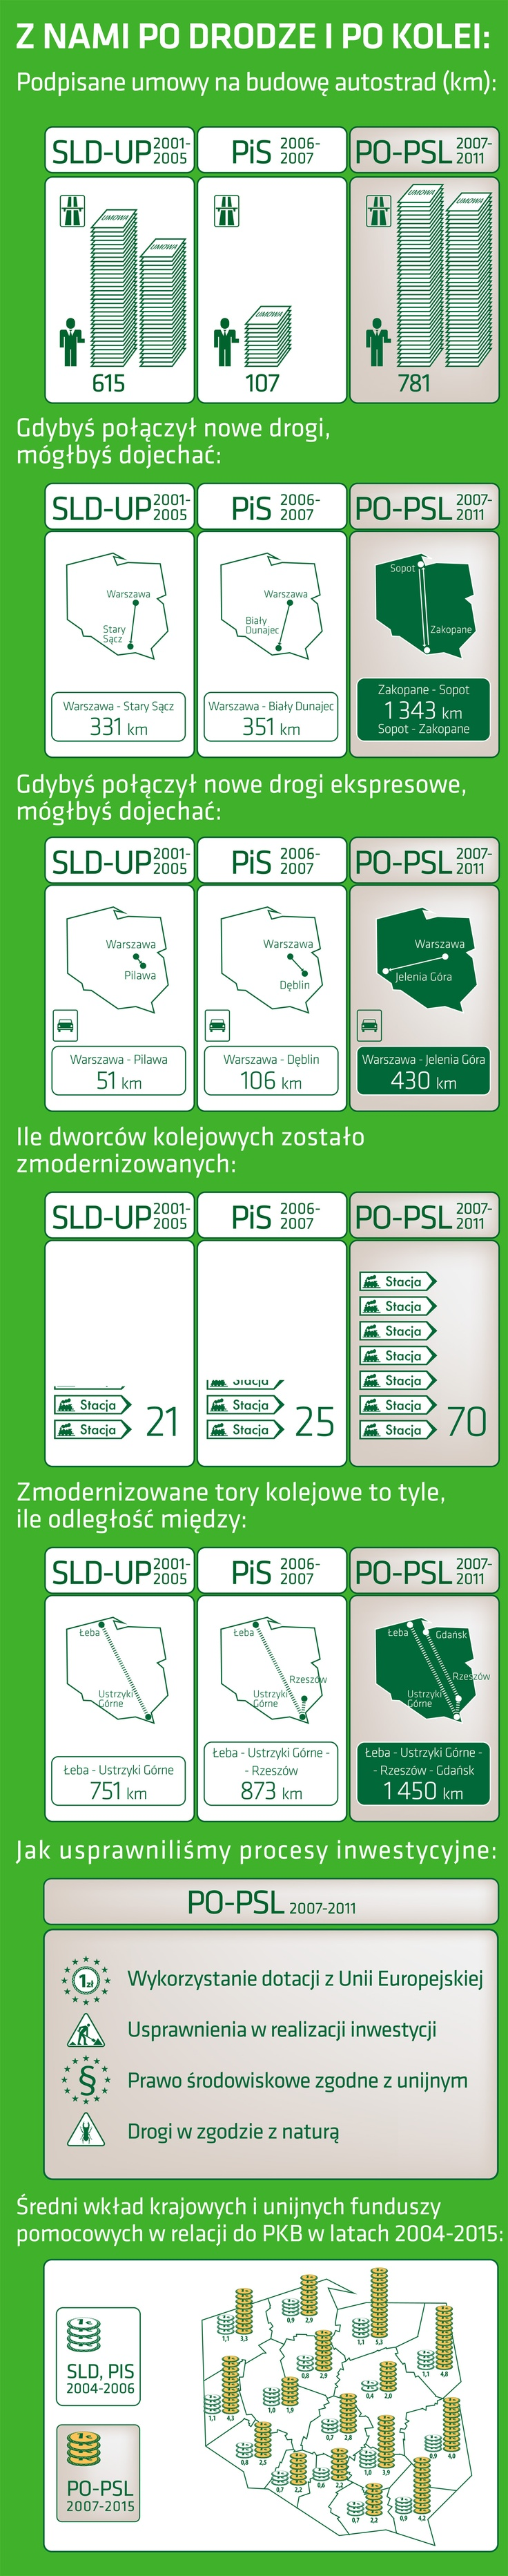 SLD-UP, PiS, PO-PSL